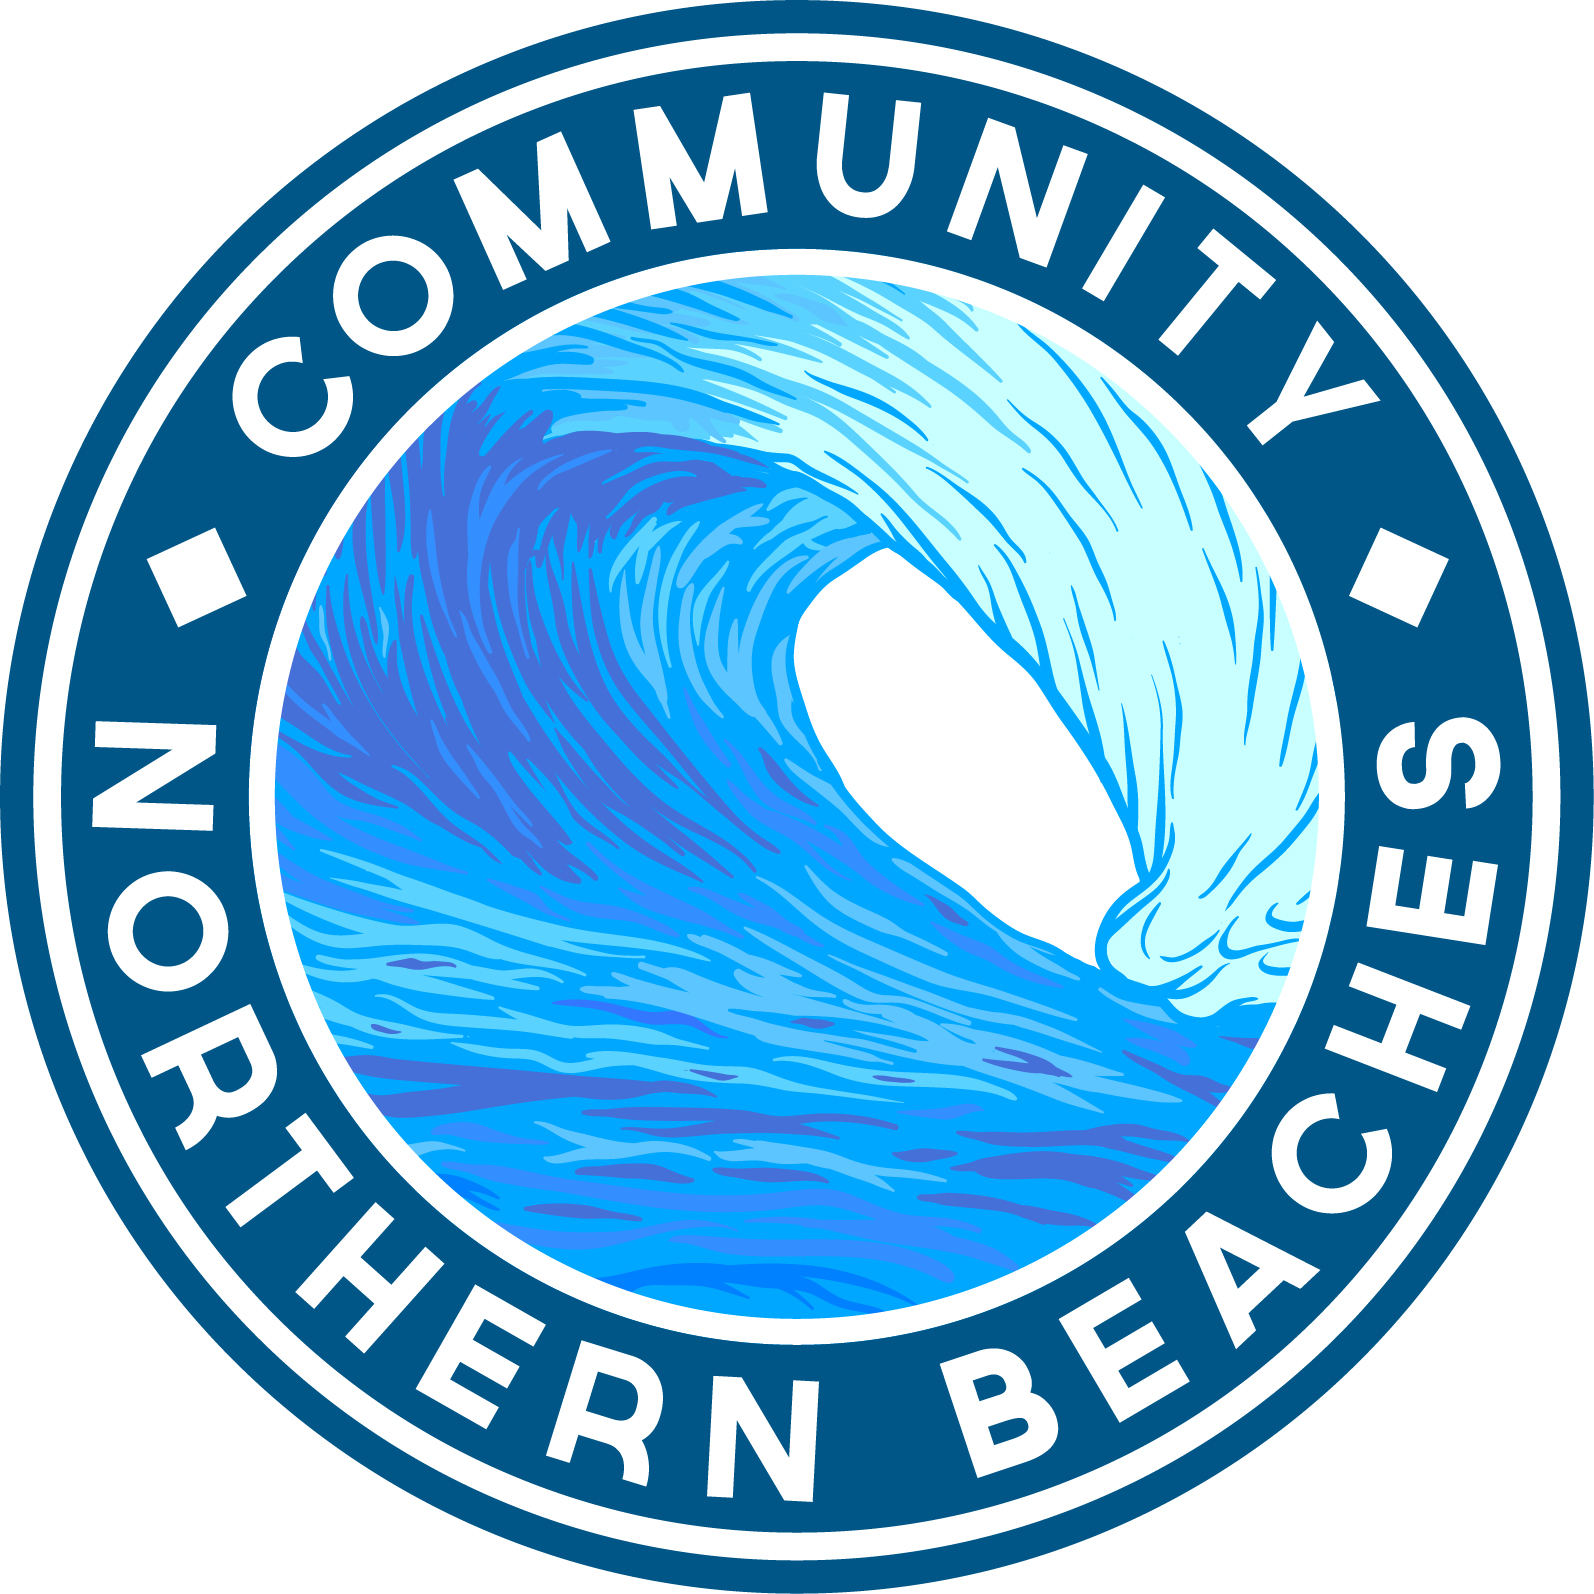 Community Northern Beaches